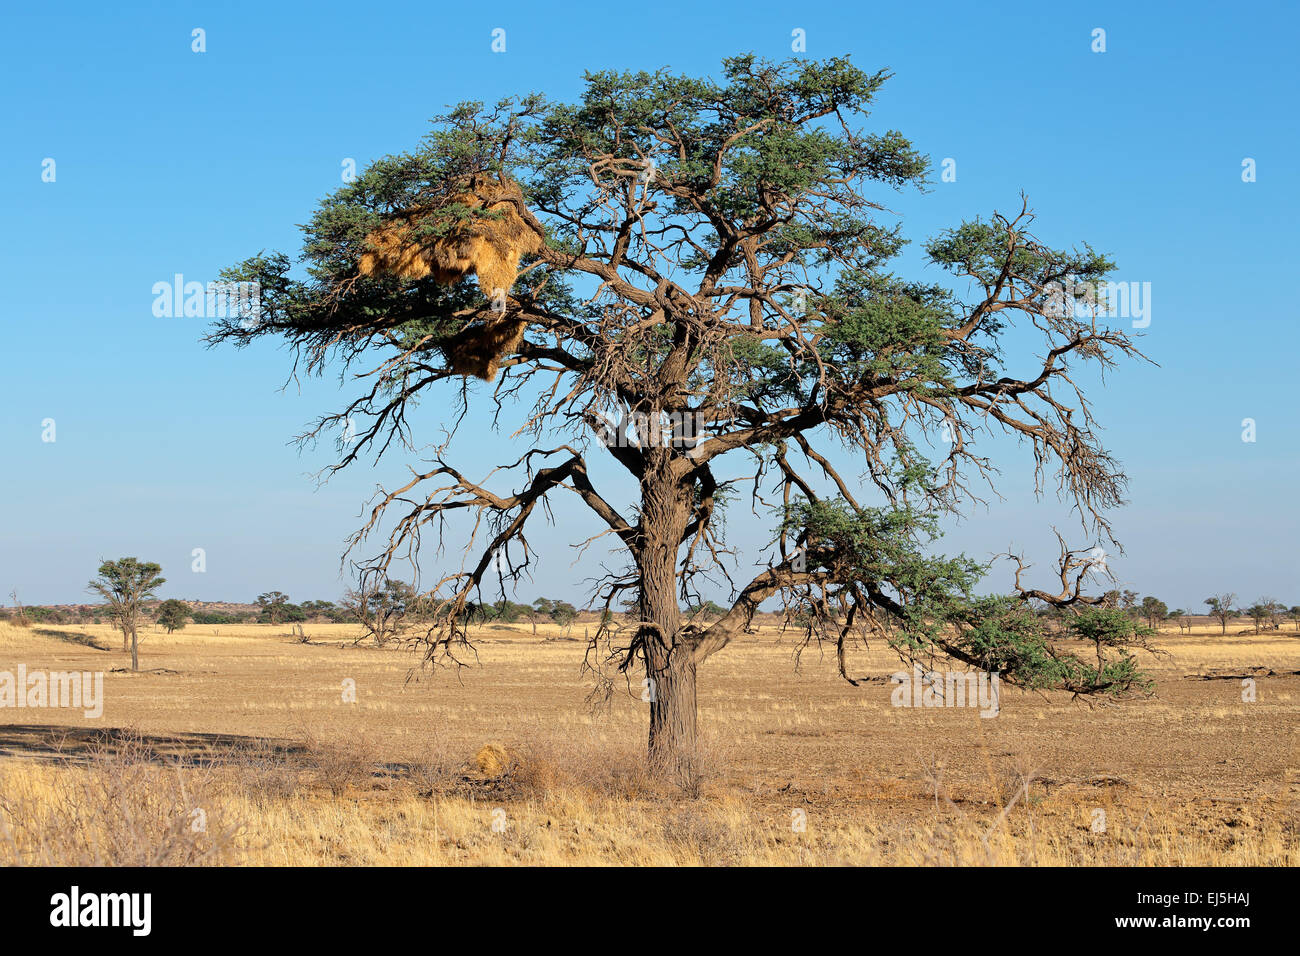 African Acacia tree with communal nest of sociable weavers (Philetairus socius), Kalahari, South Africa - Stock Image